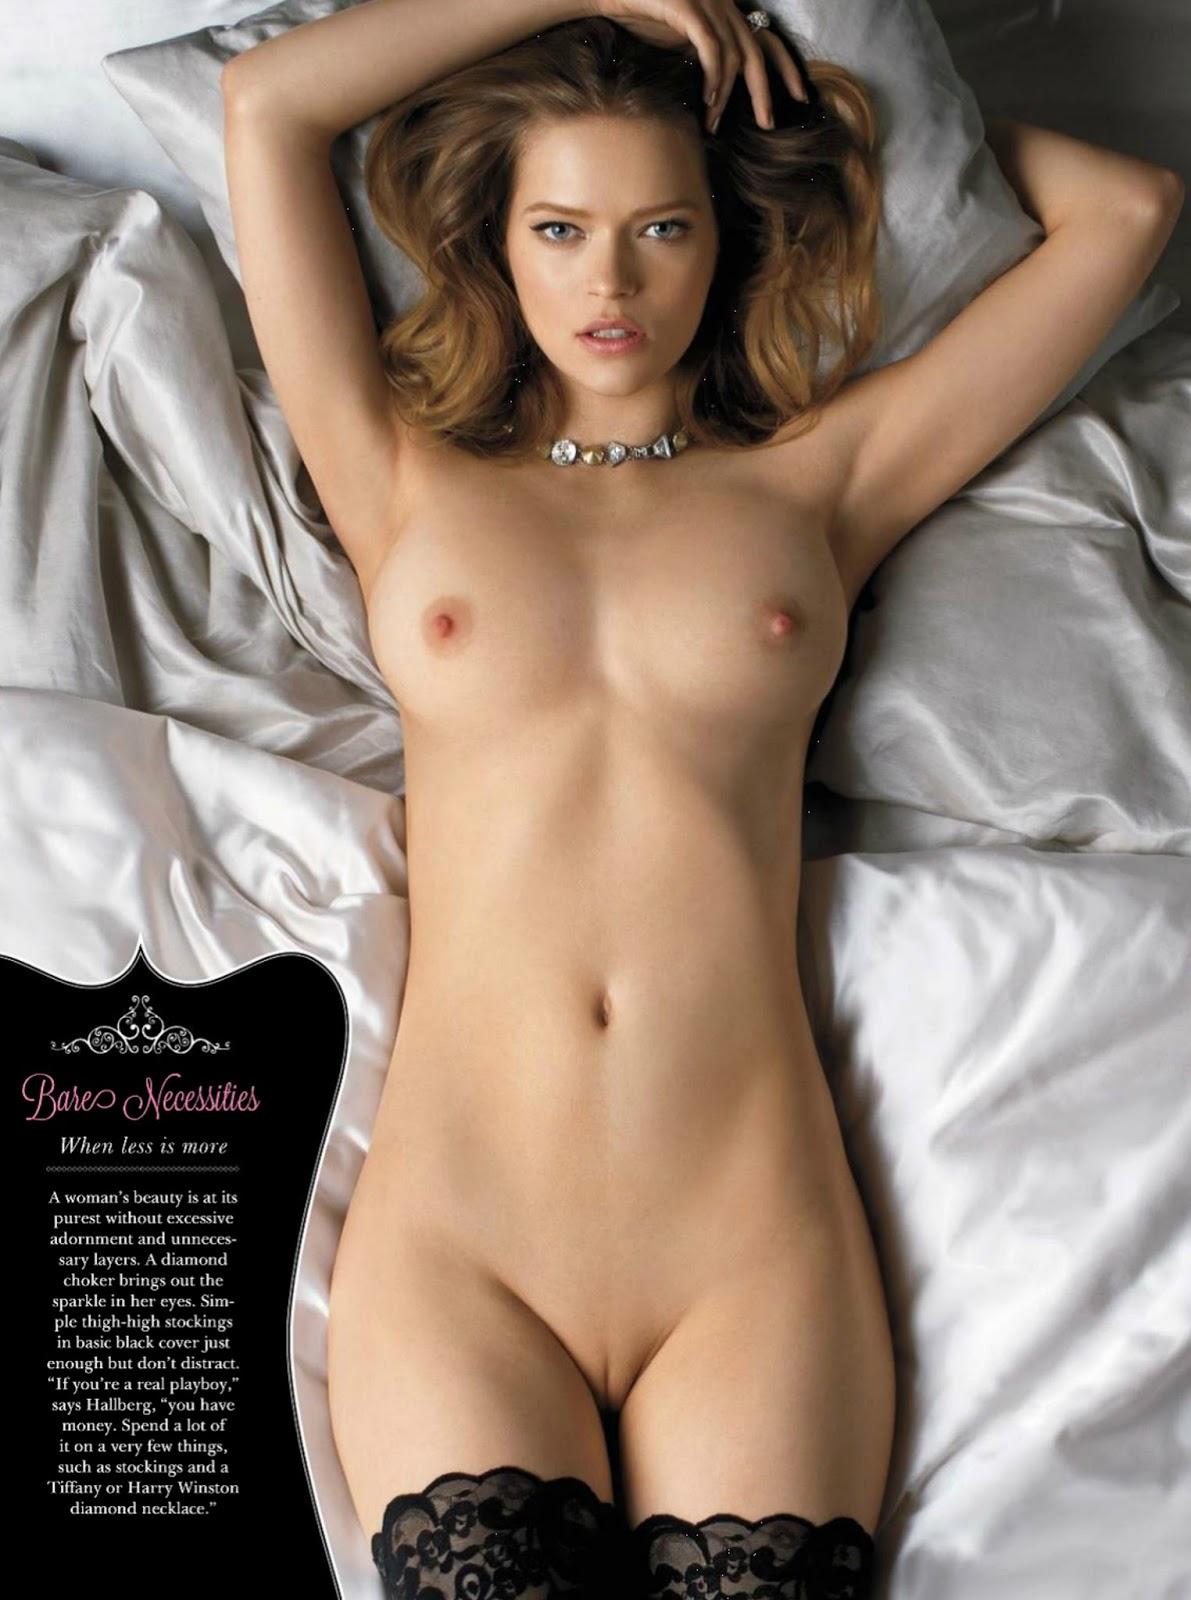 norah jones naked nude